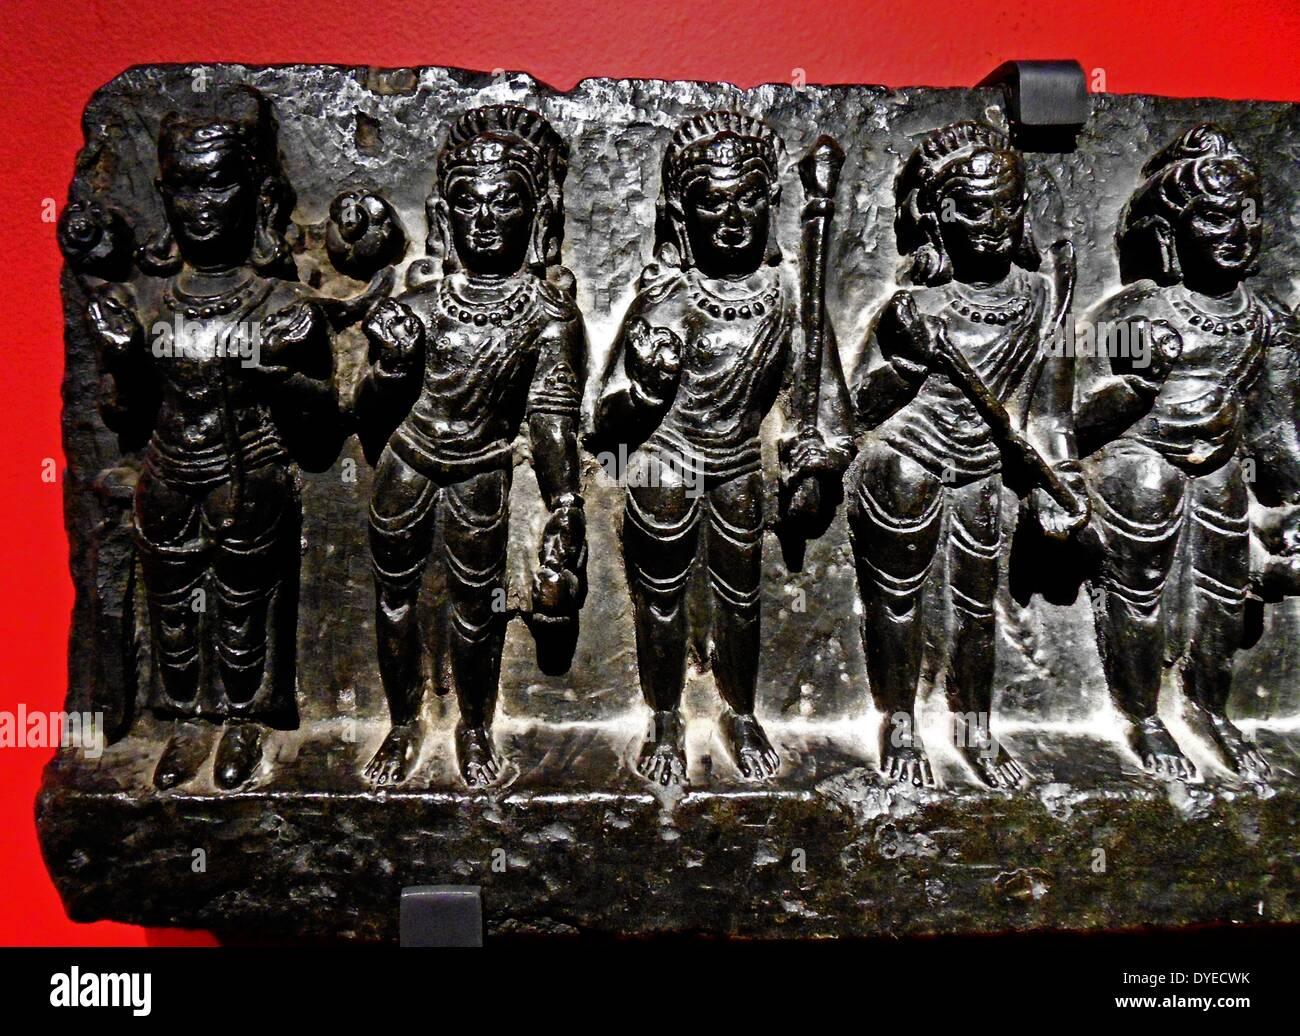 The Planetary Deities 1000 B.C. - Stock Image